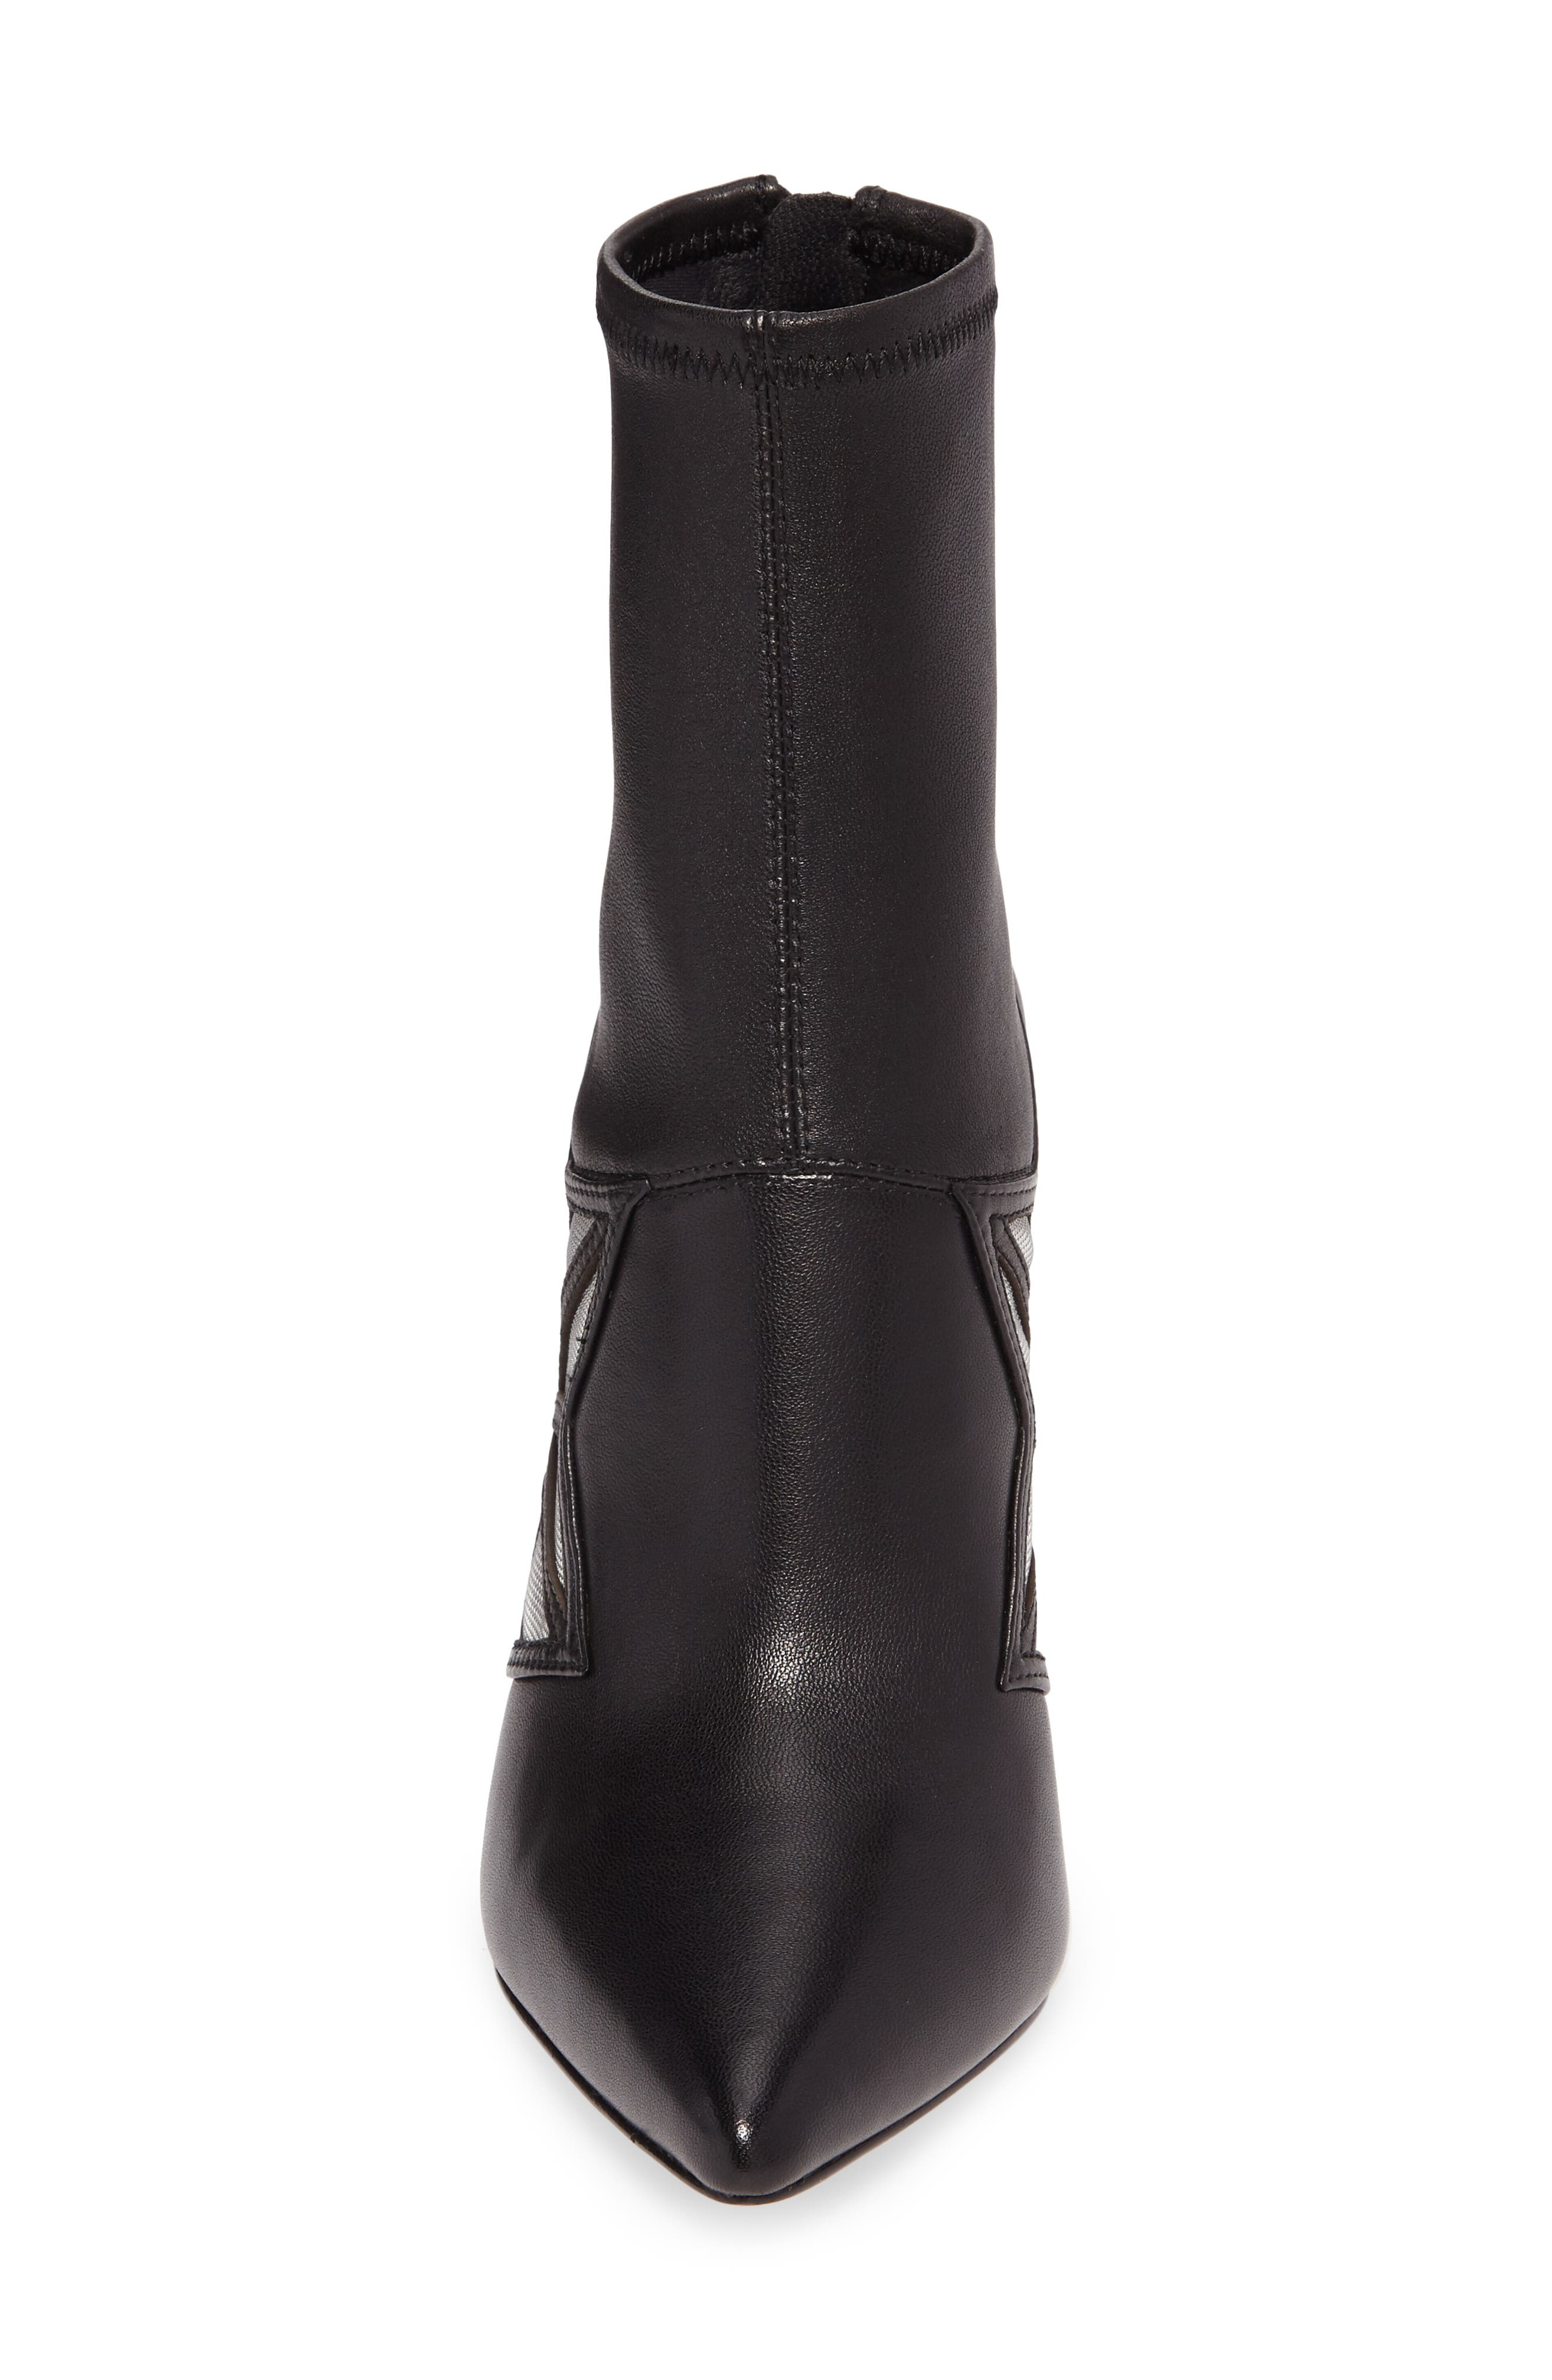 Ceara Bootie,                             Alternate thumbnail 4, color,                             Black Leather